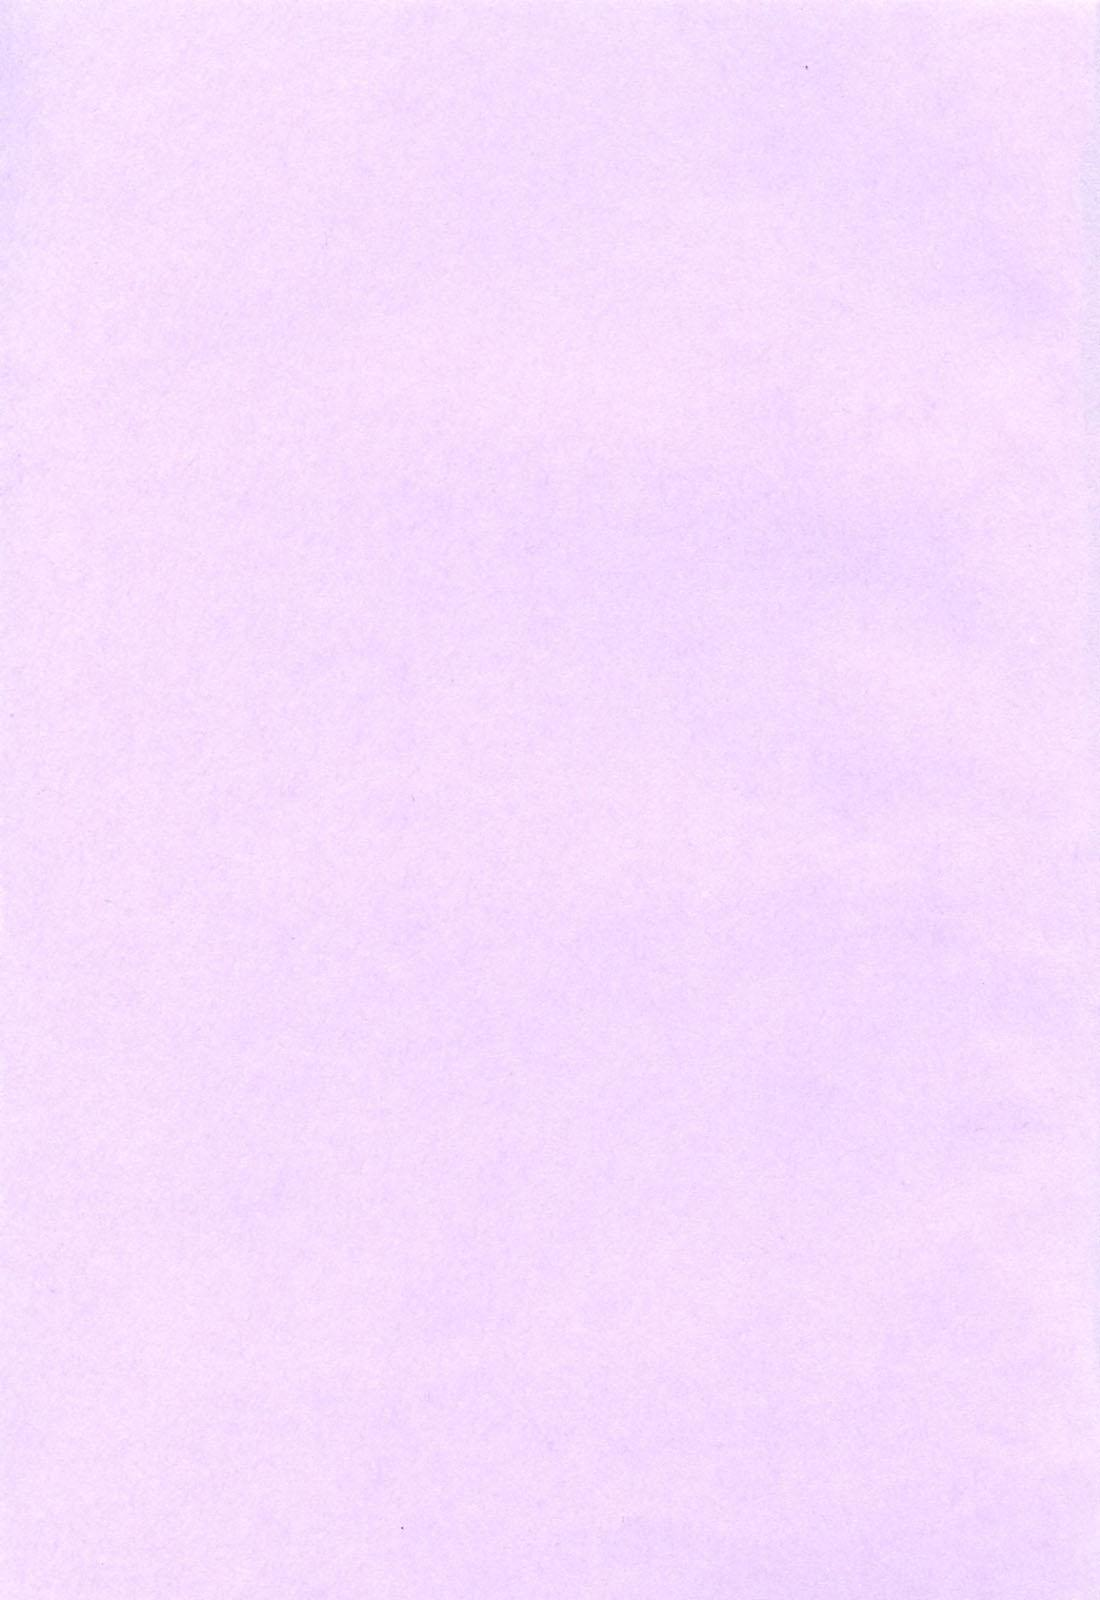 Kanjuku Hitozuma Nikki - The diary of the mature married woman 4